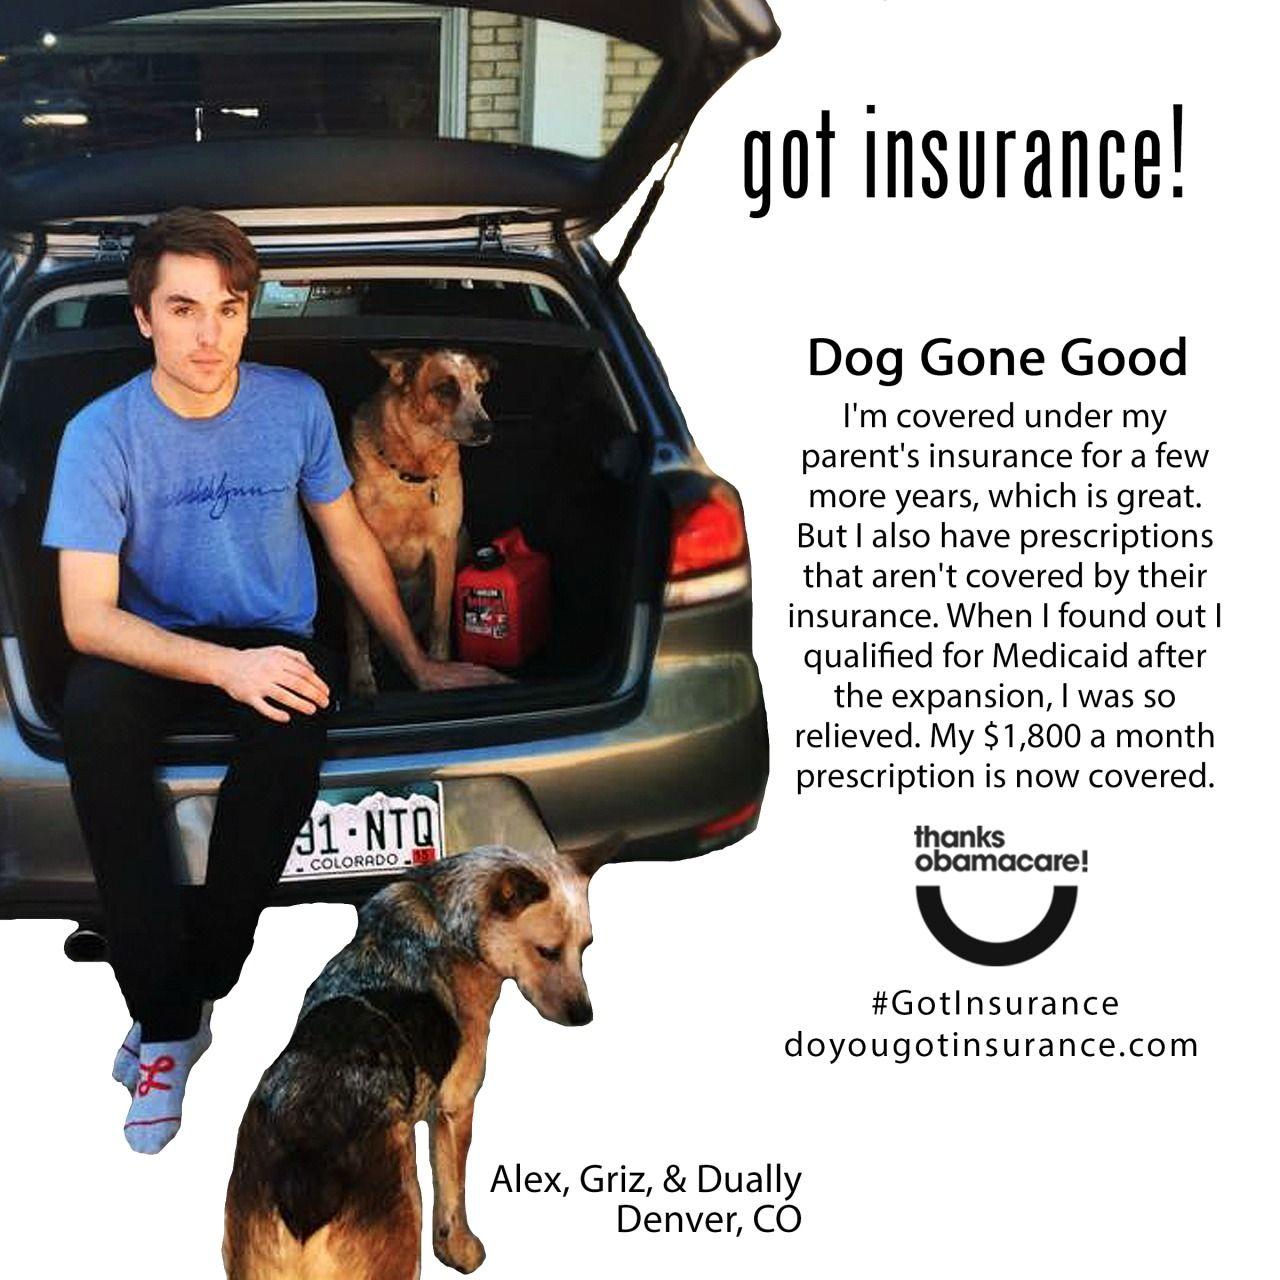 Do you#GotInsurance. Learn more at DoYouGotInsurance.com.#ThanksObamacare!